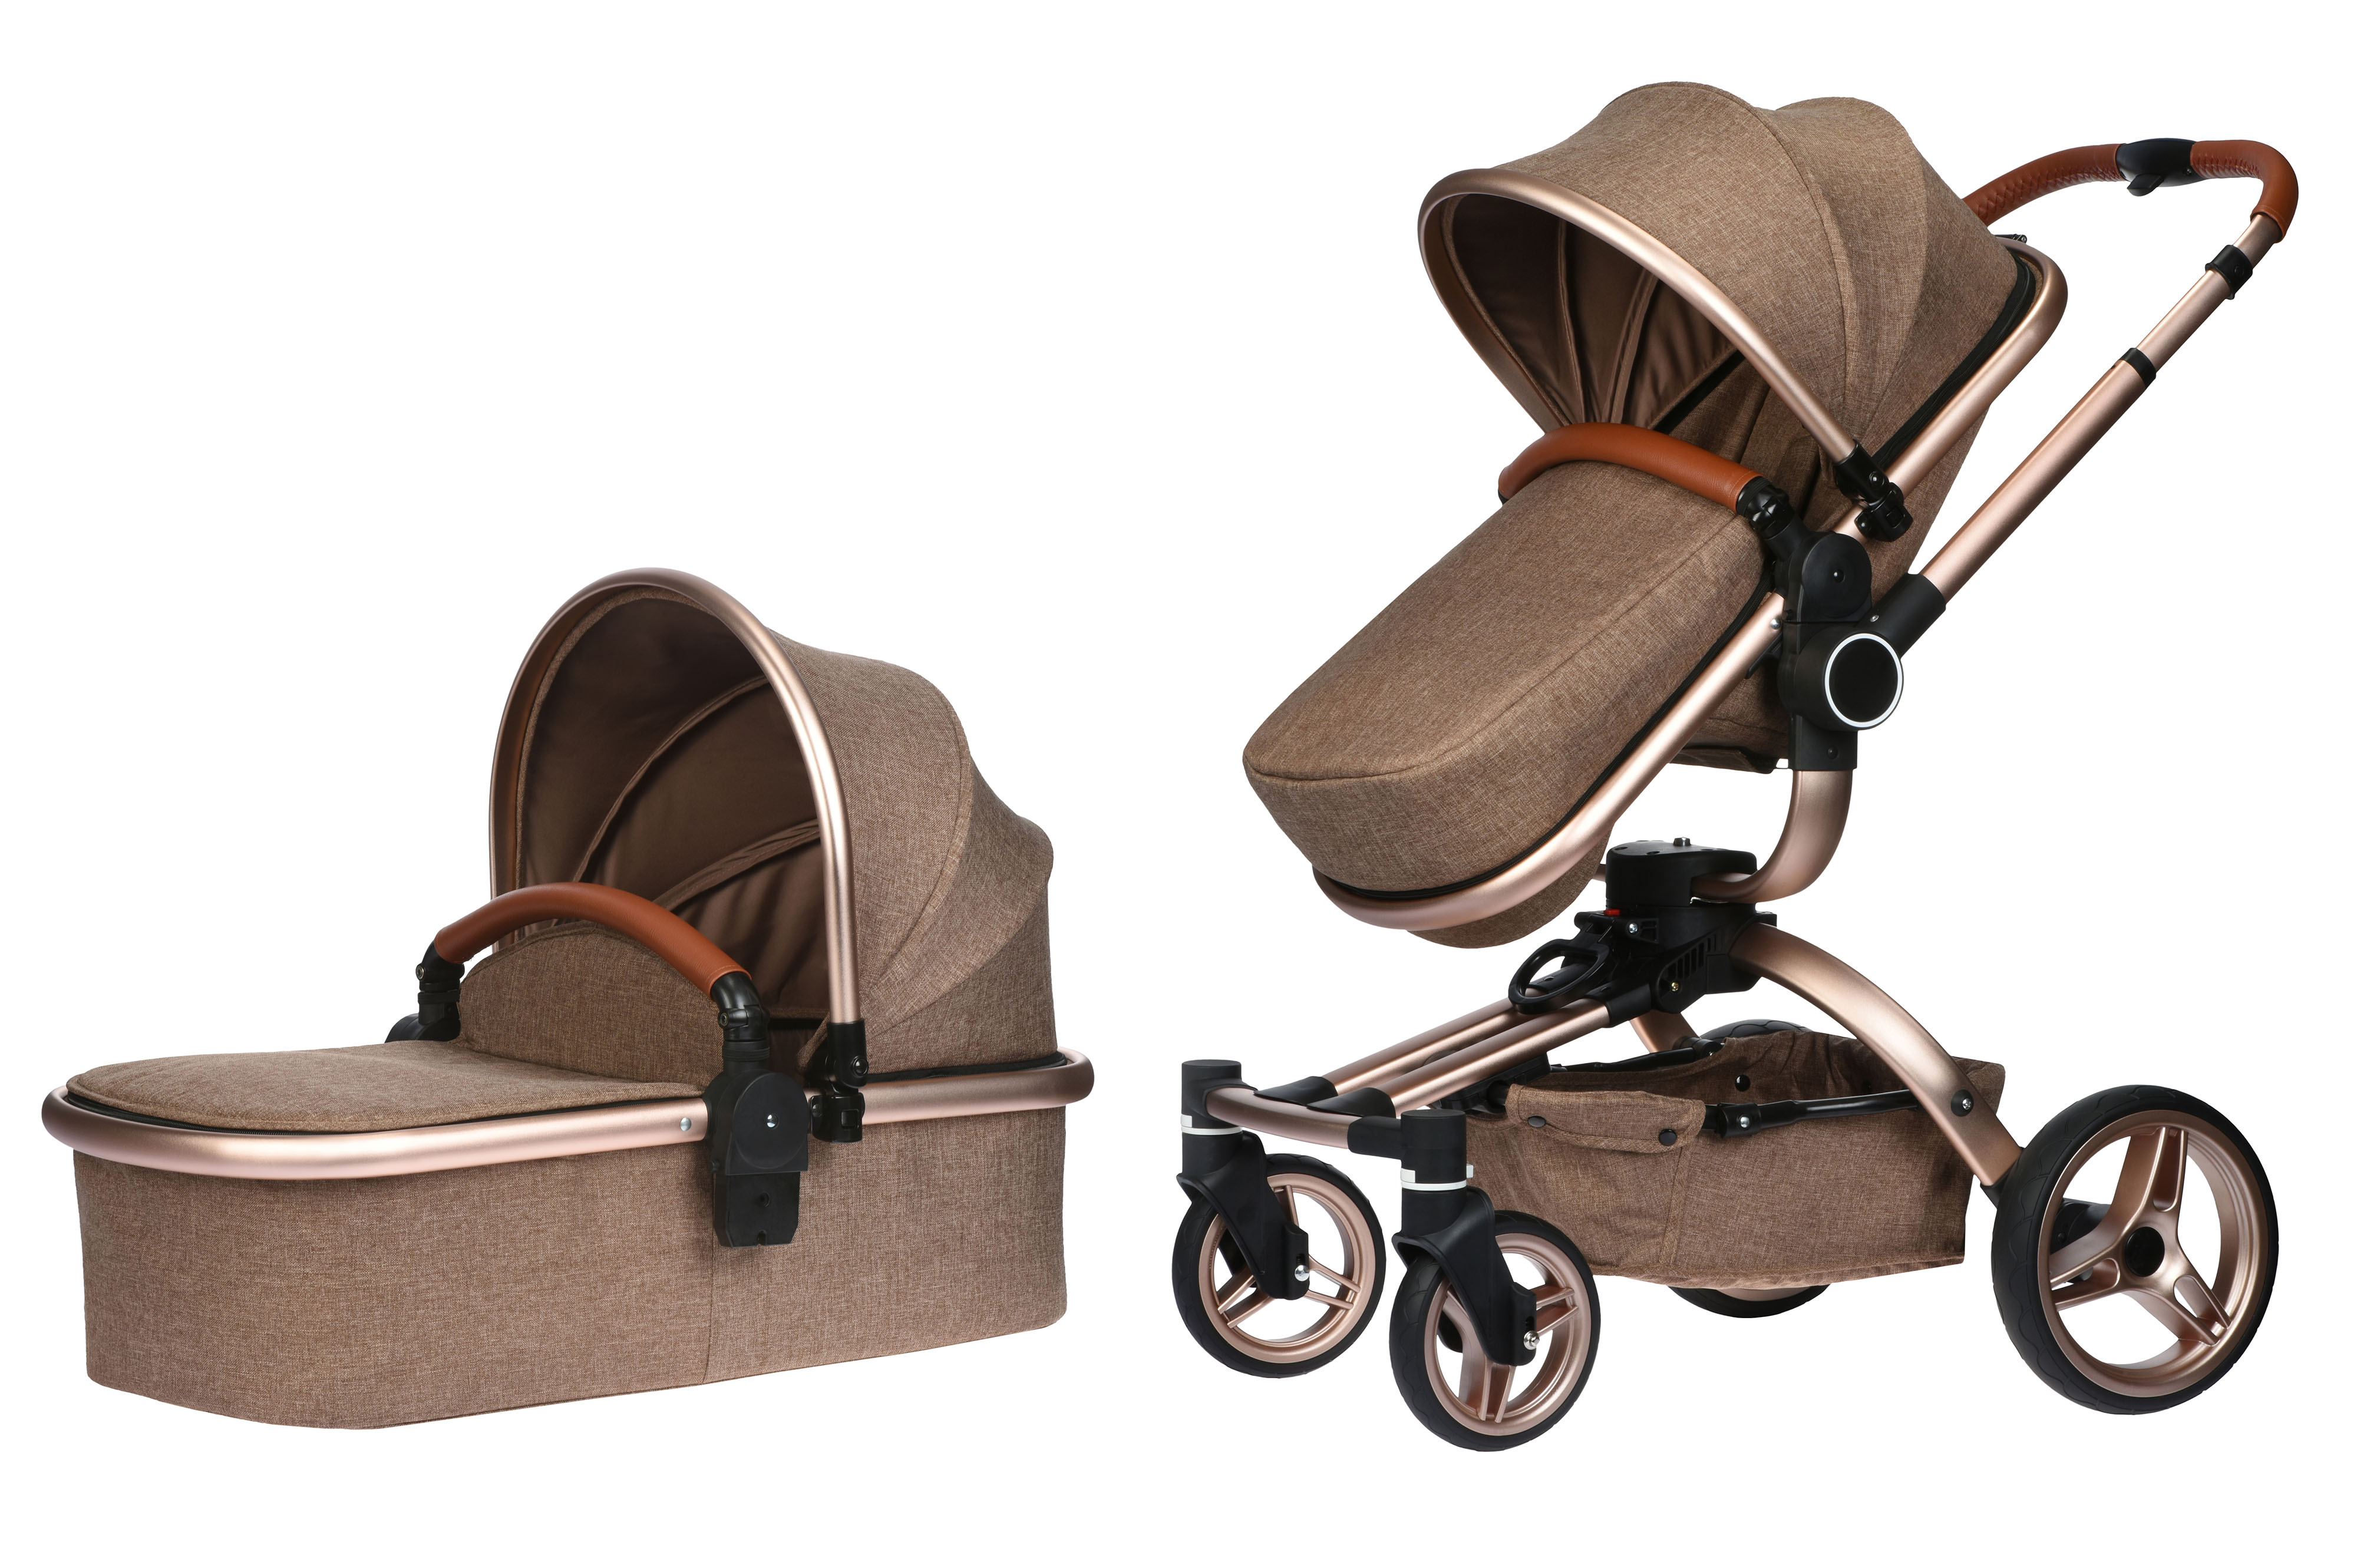 Miqilong Універсальна коляска 2в1 V baby X159[X159-02]